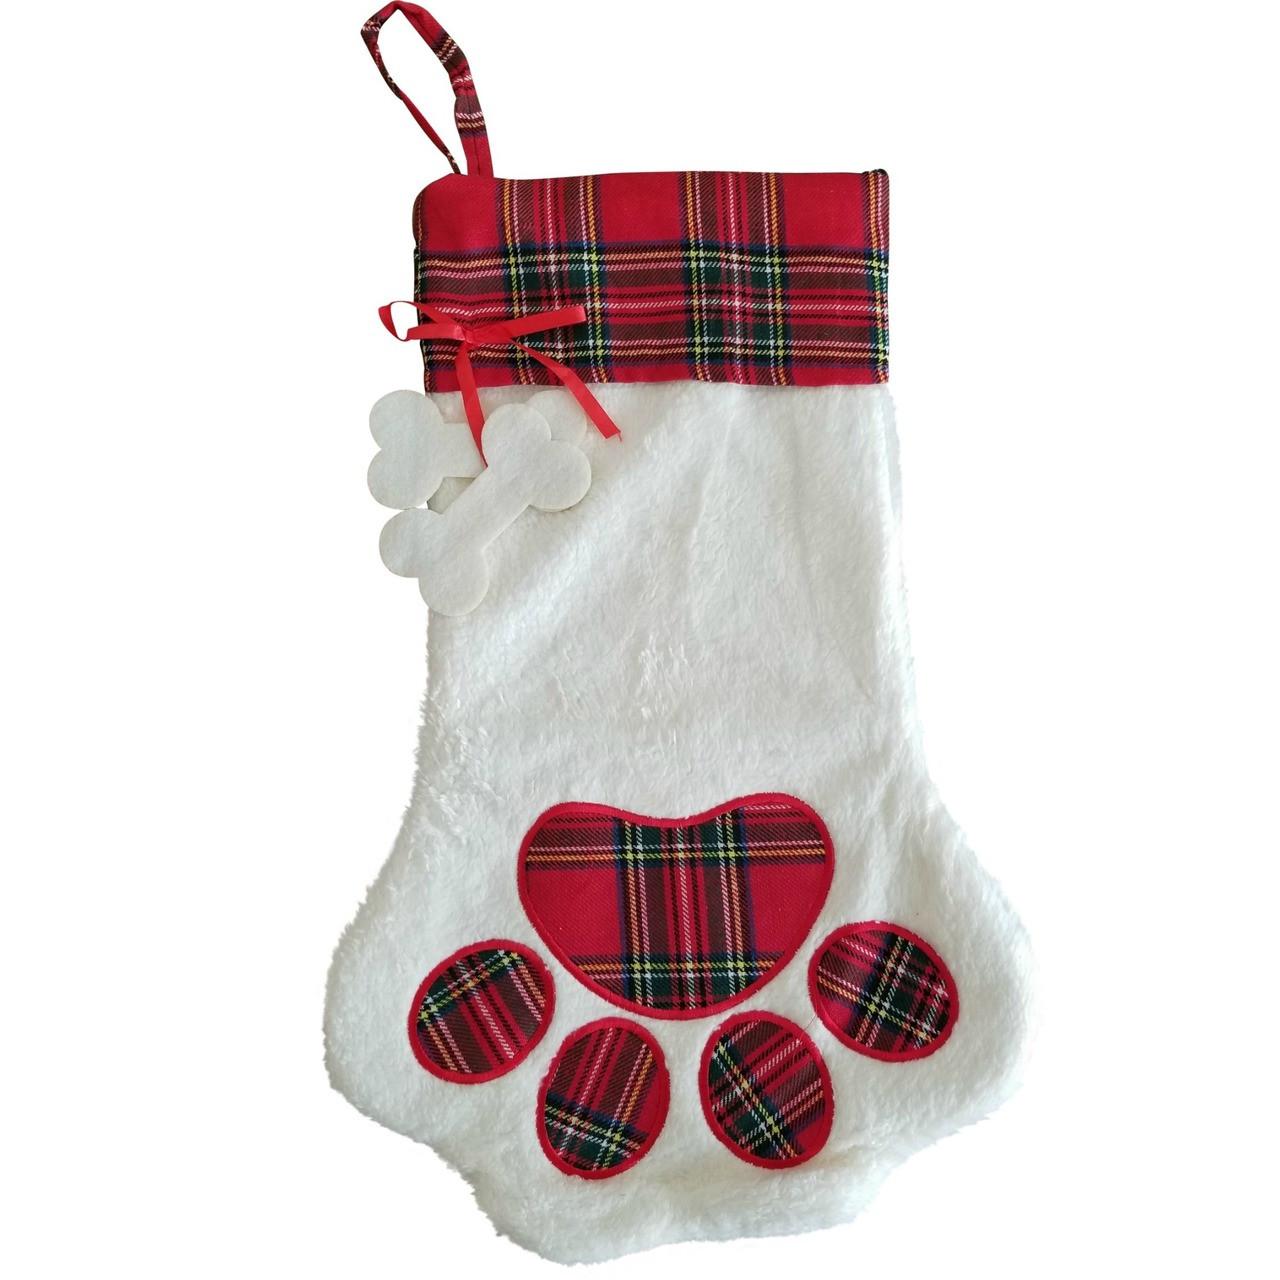 Dog Paw Plaid Christmas Stocking - My Vinyl Direct